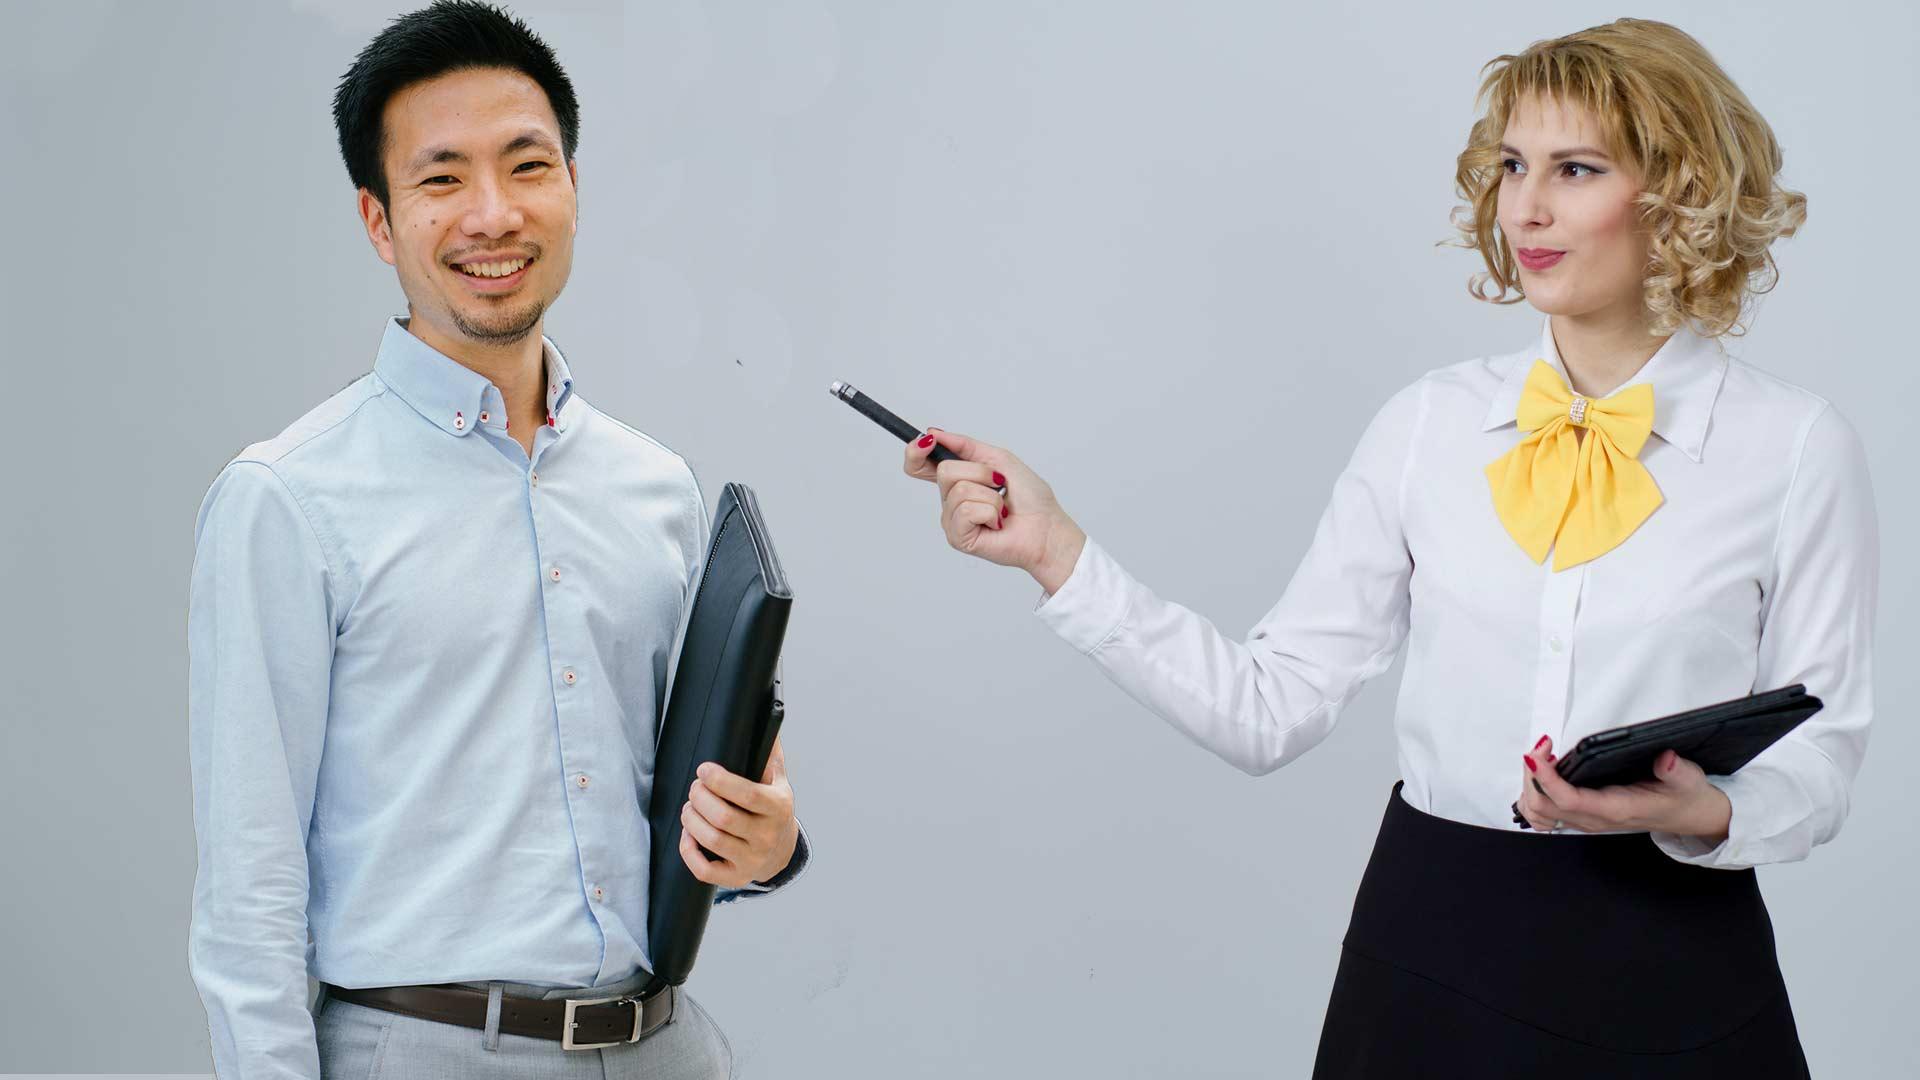 Insurance Agents vs Adjuster